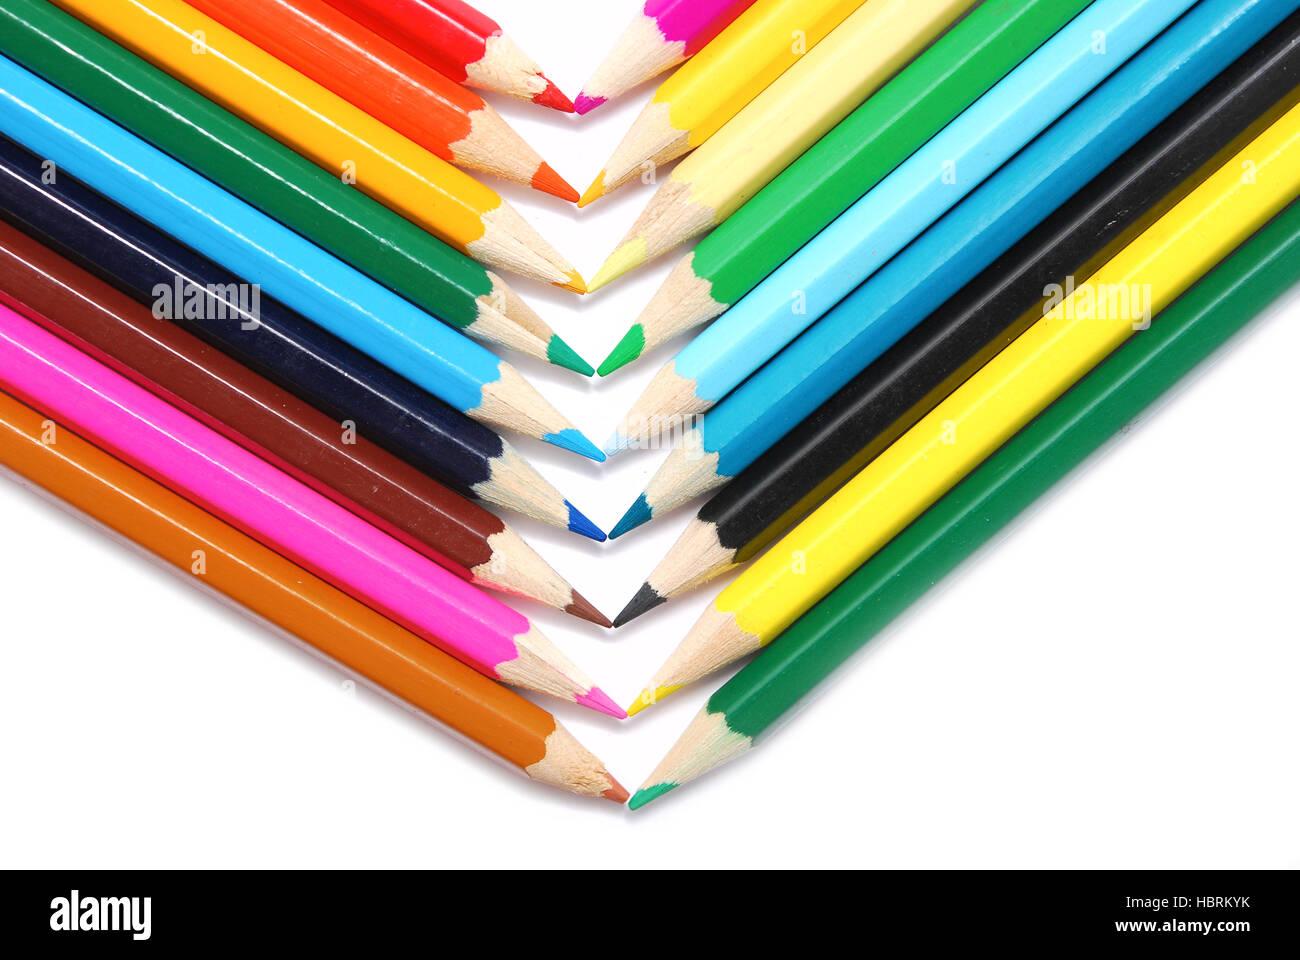 pencils - Stock Image